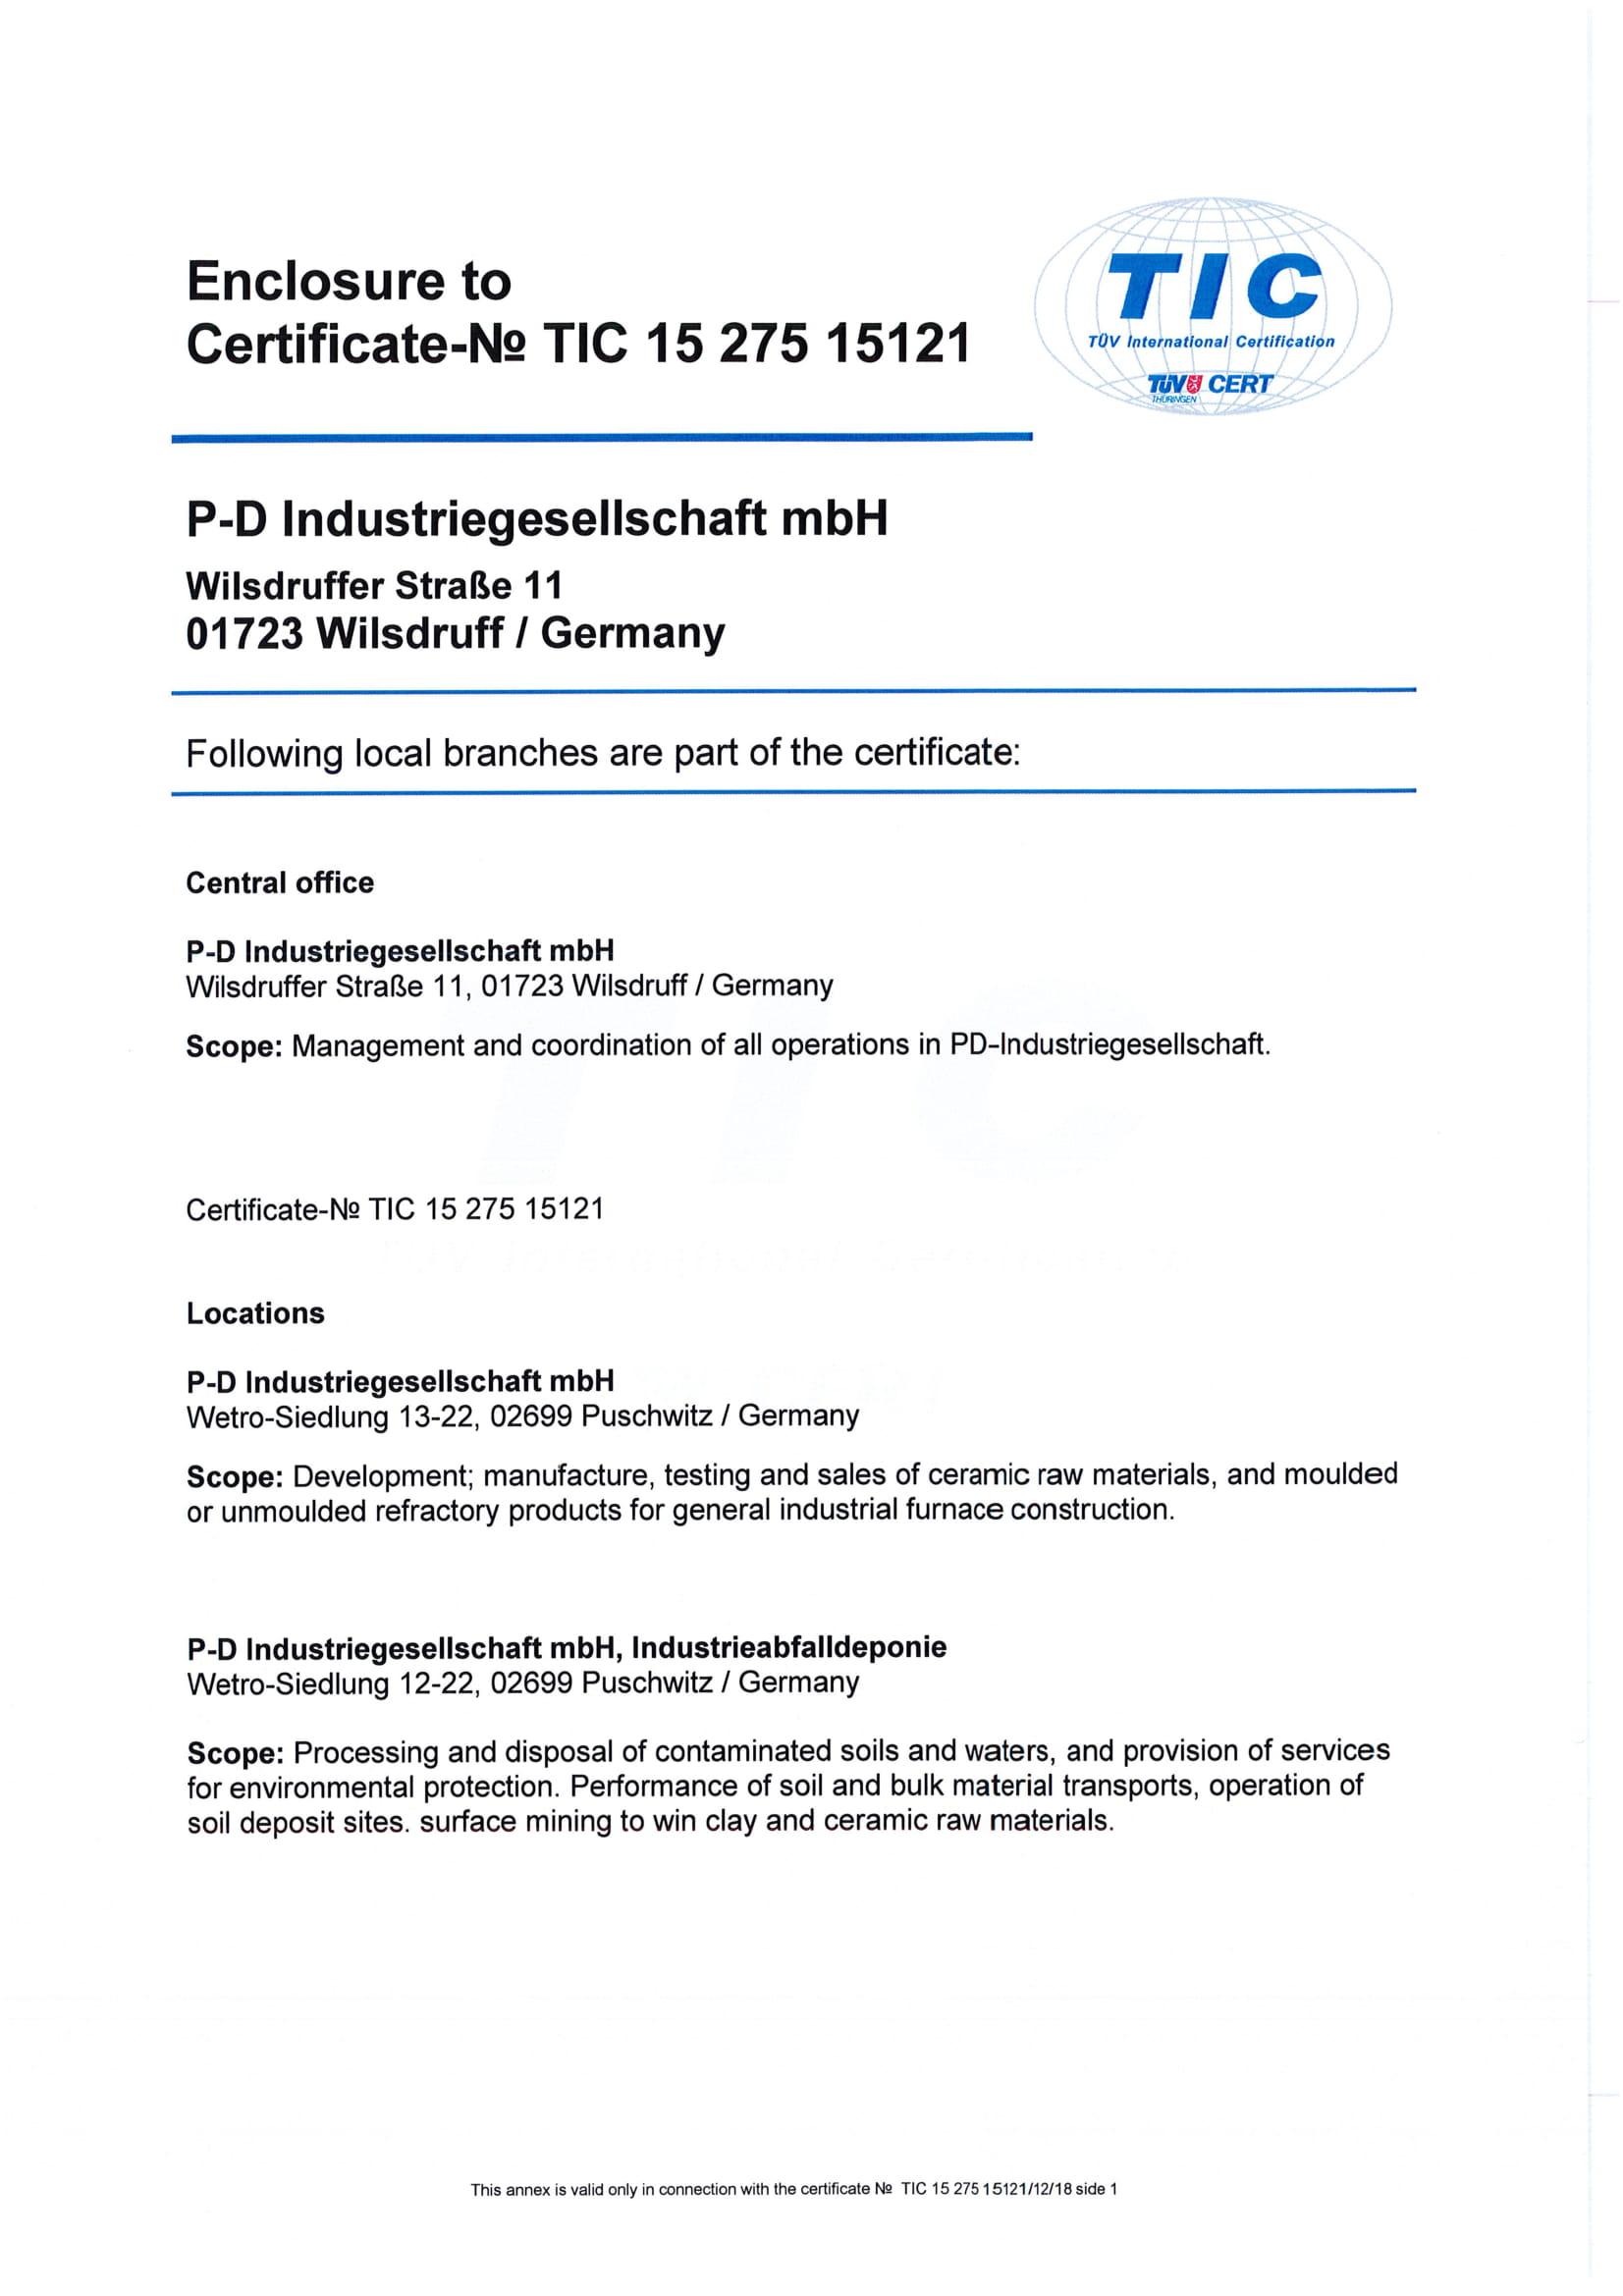 P-D Industriegesellschaft mbH · DIN EN ISO 50001:2011 (Enclosure)